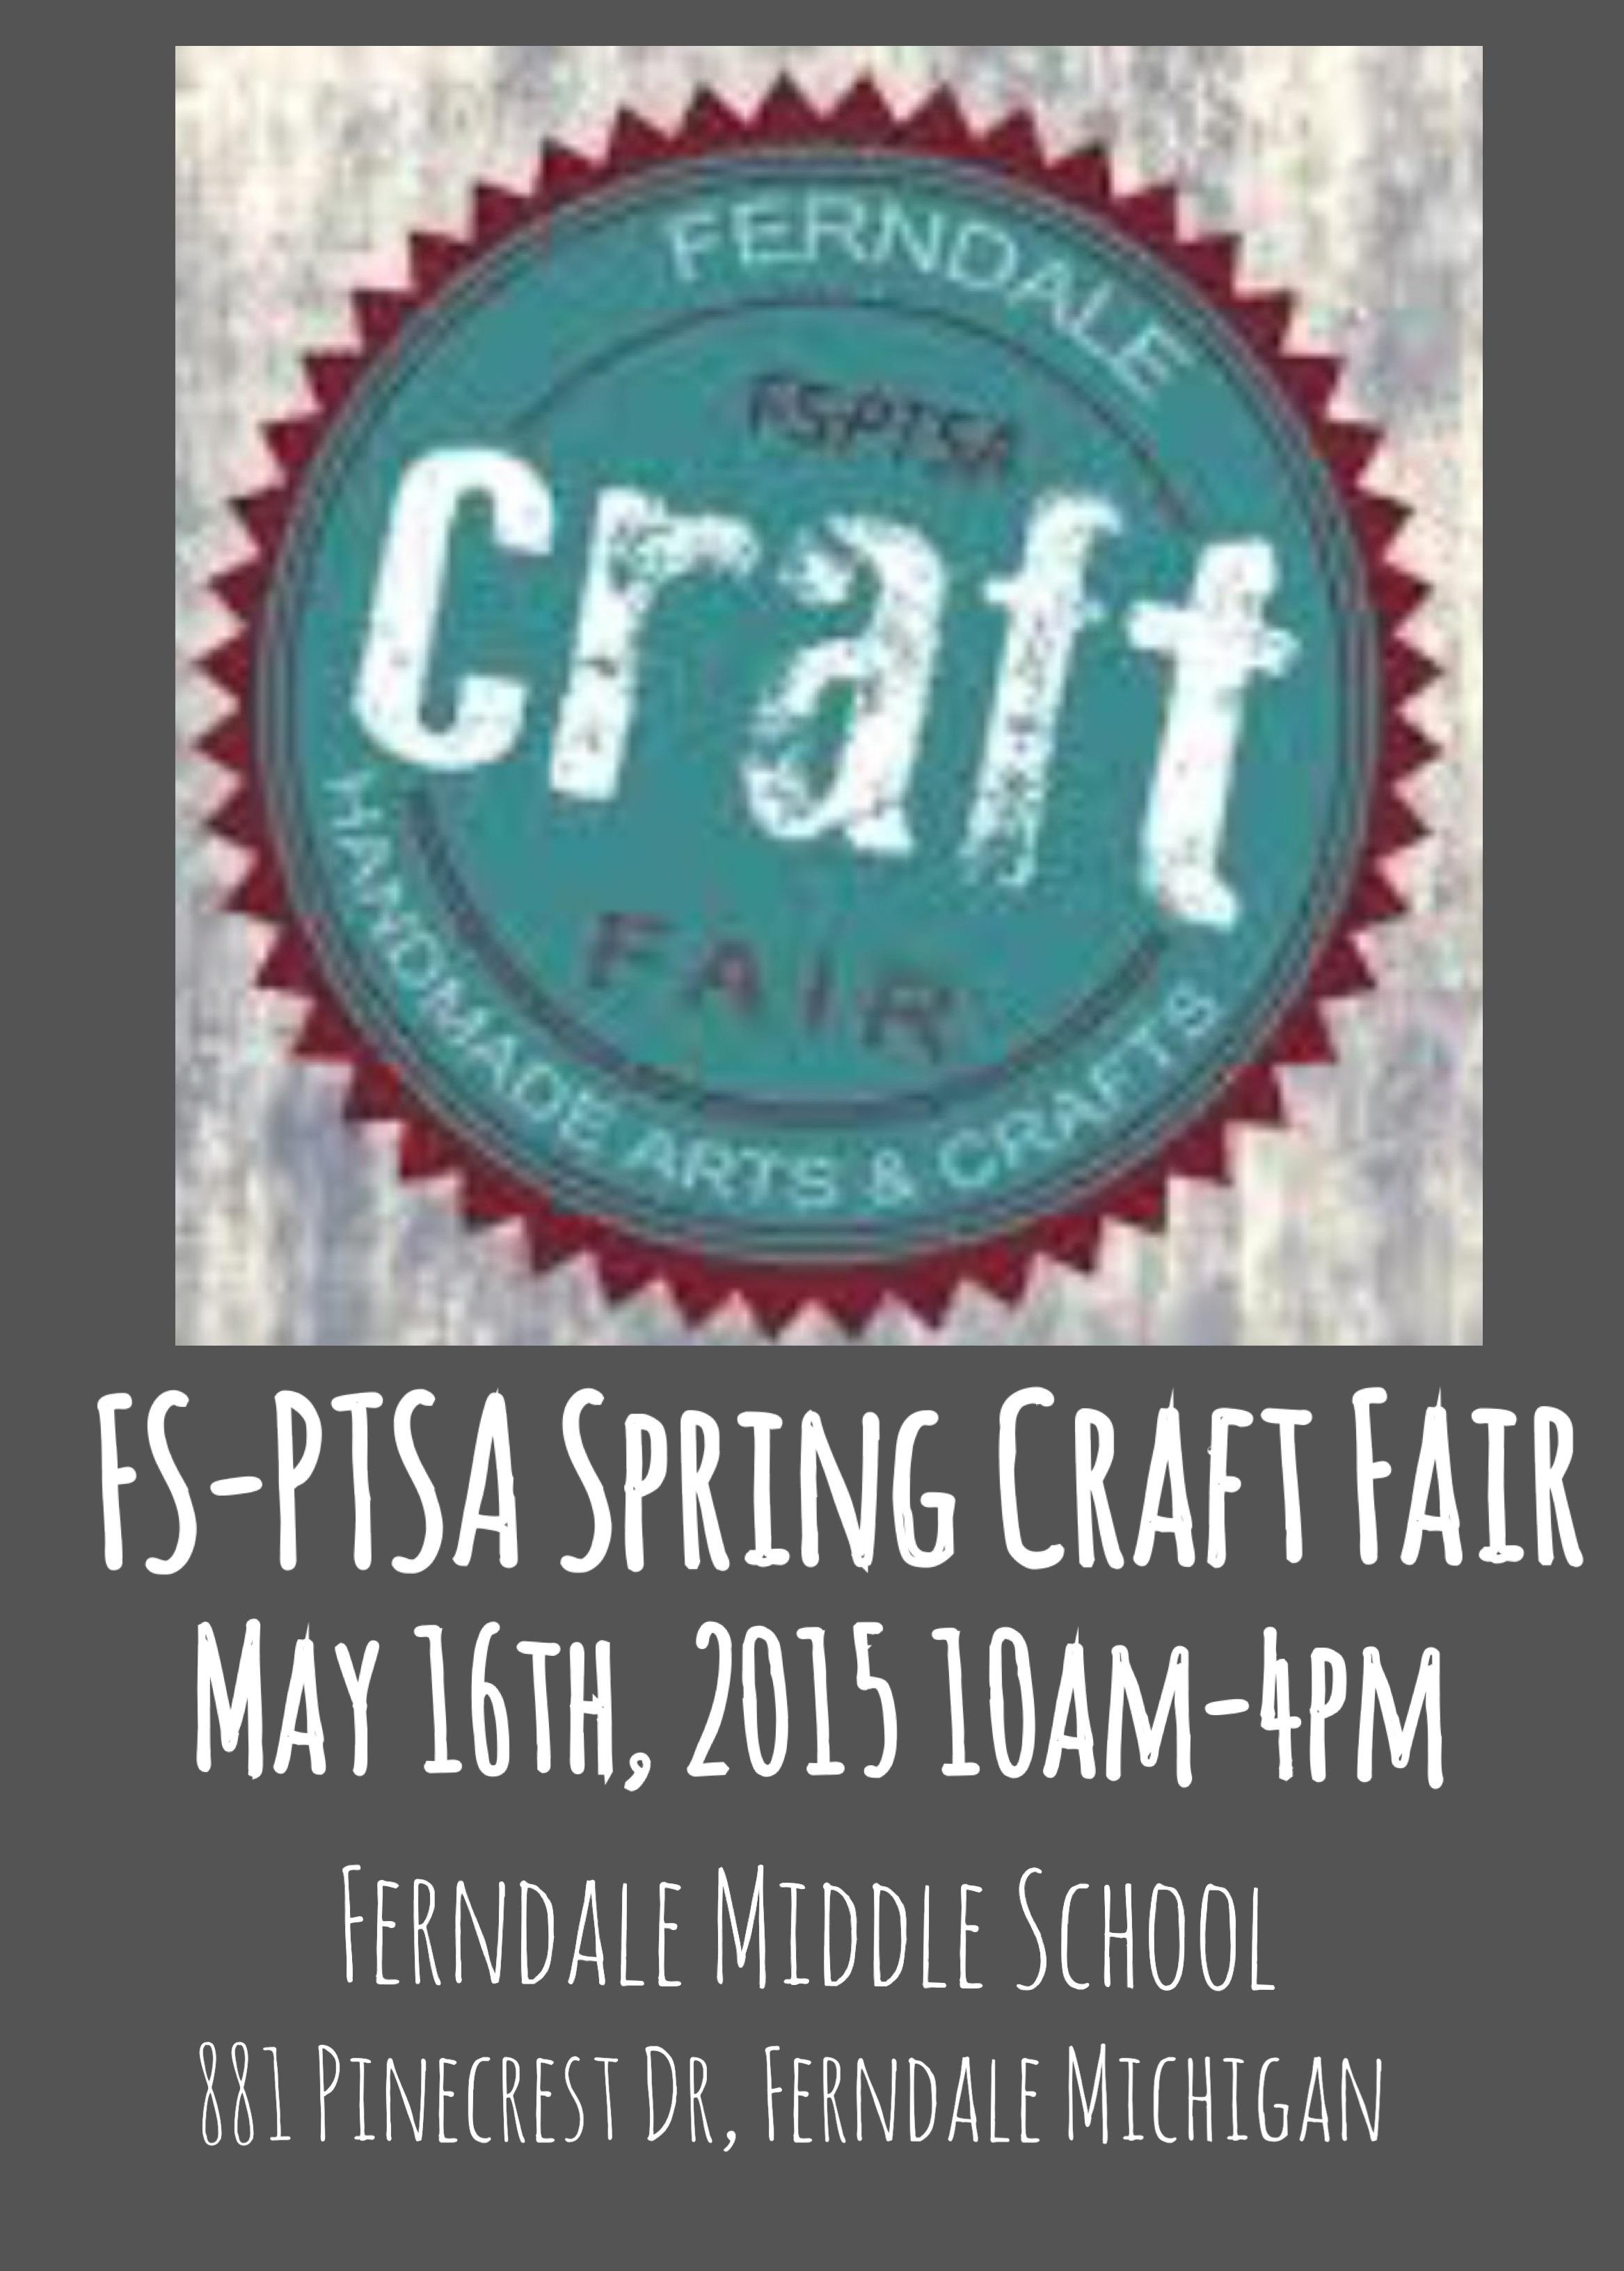 FS-PTSA Spring Craft Fair 2015